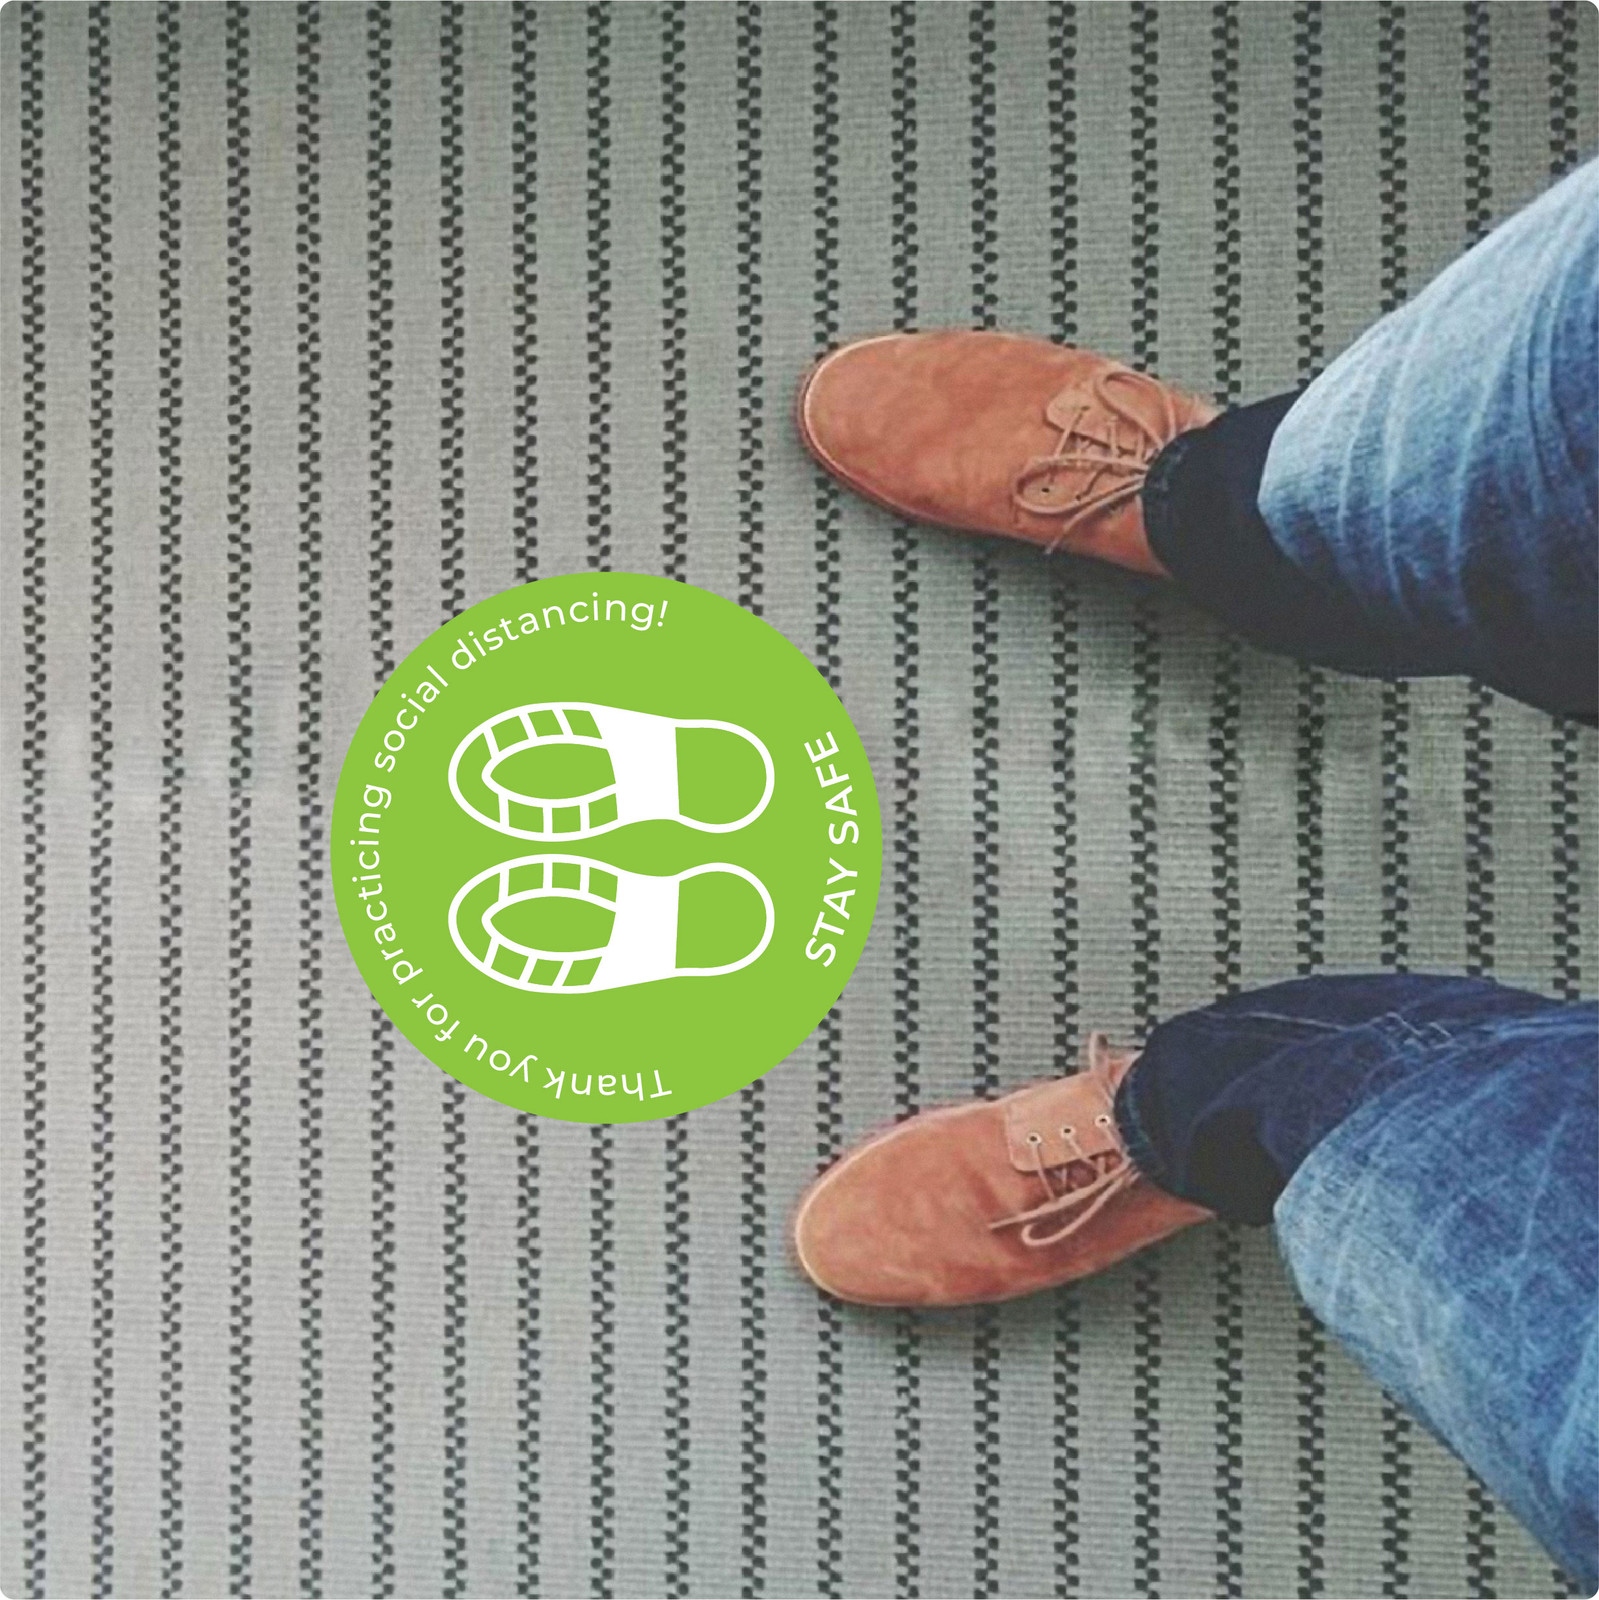 social distancing floor sticker for carpet. Self-adhesive Corona virus floor sticker to help social distancing.